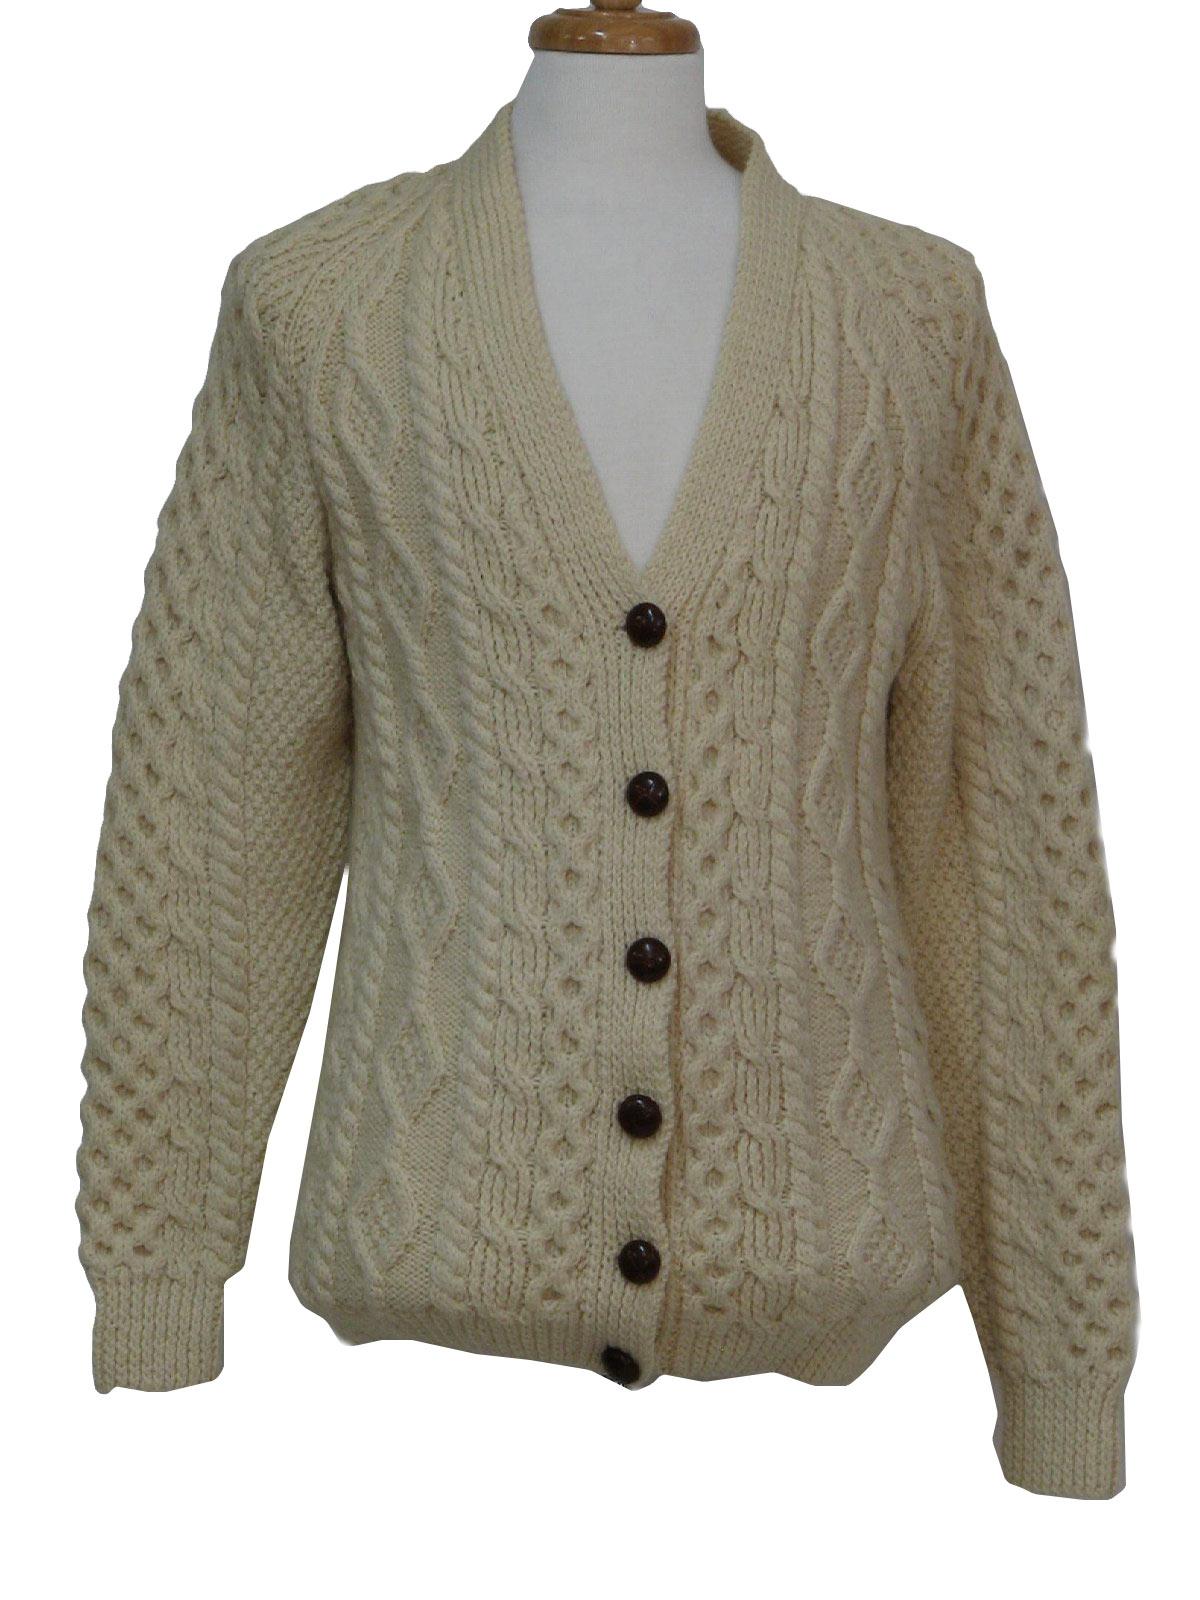 1970's Vintage Una Oniel Caridgan Sweater: 70s -Una Oniel- Mens ...